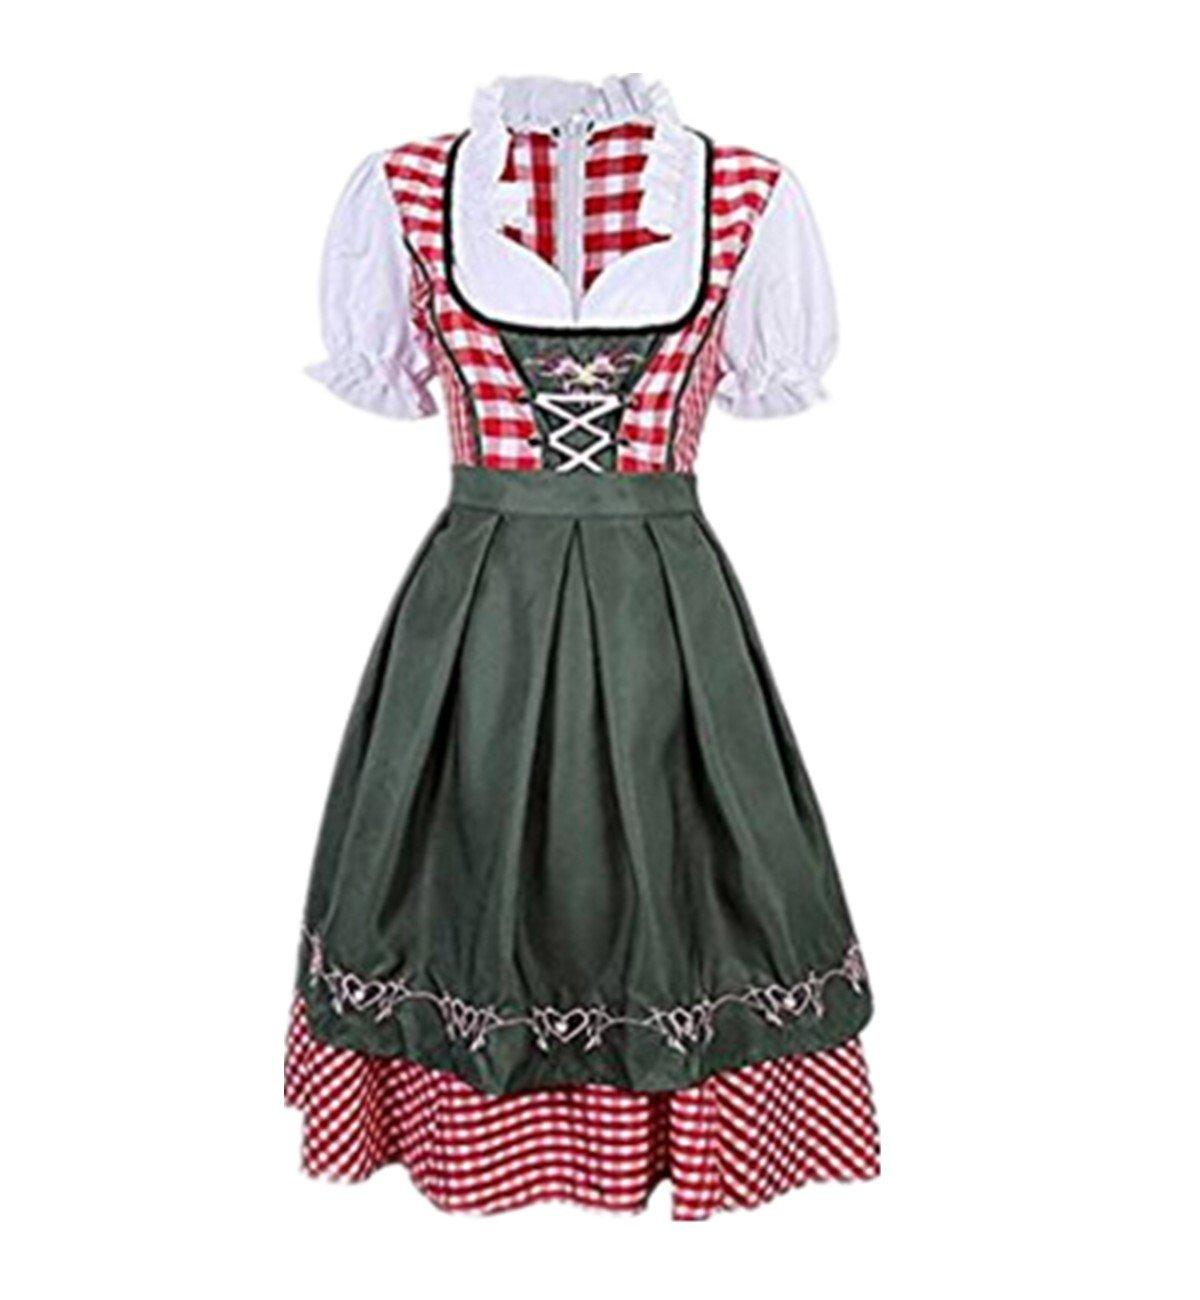 Prettycos Disfraz de Bavara Tirolesa Mujer Vestido de Oktoberfest ...